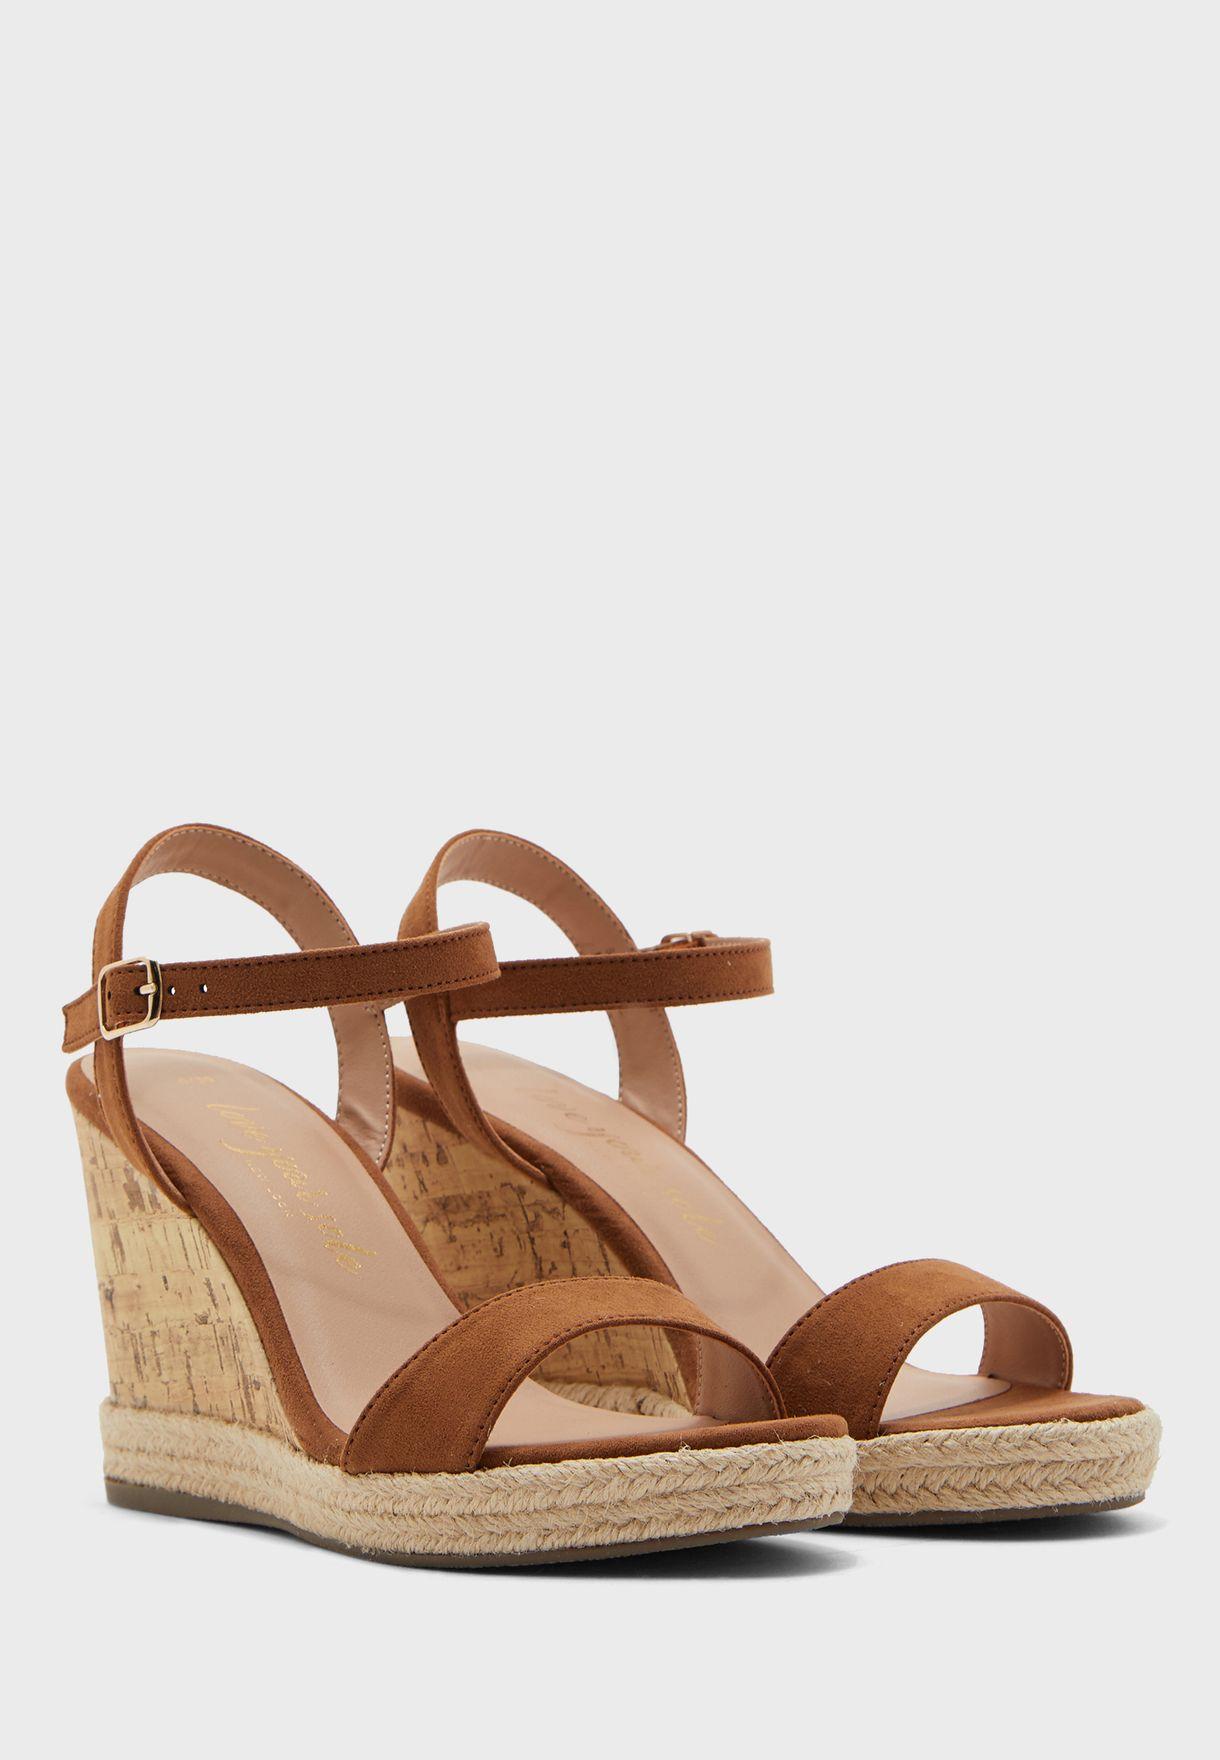 Perth Ankle Strap Wedge Sandal